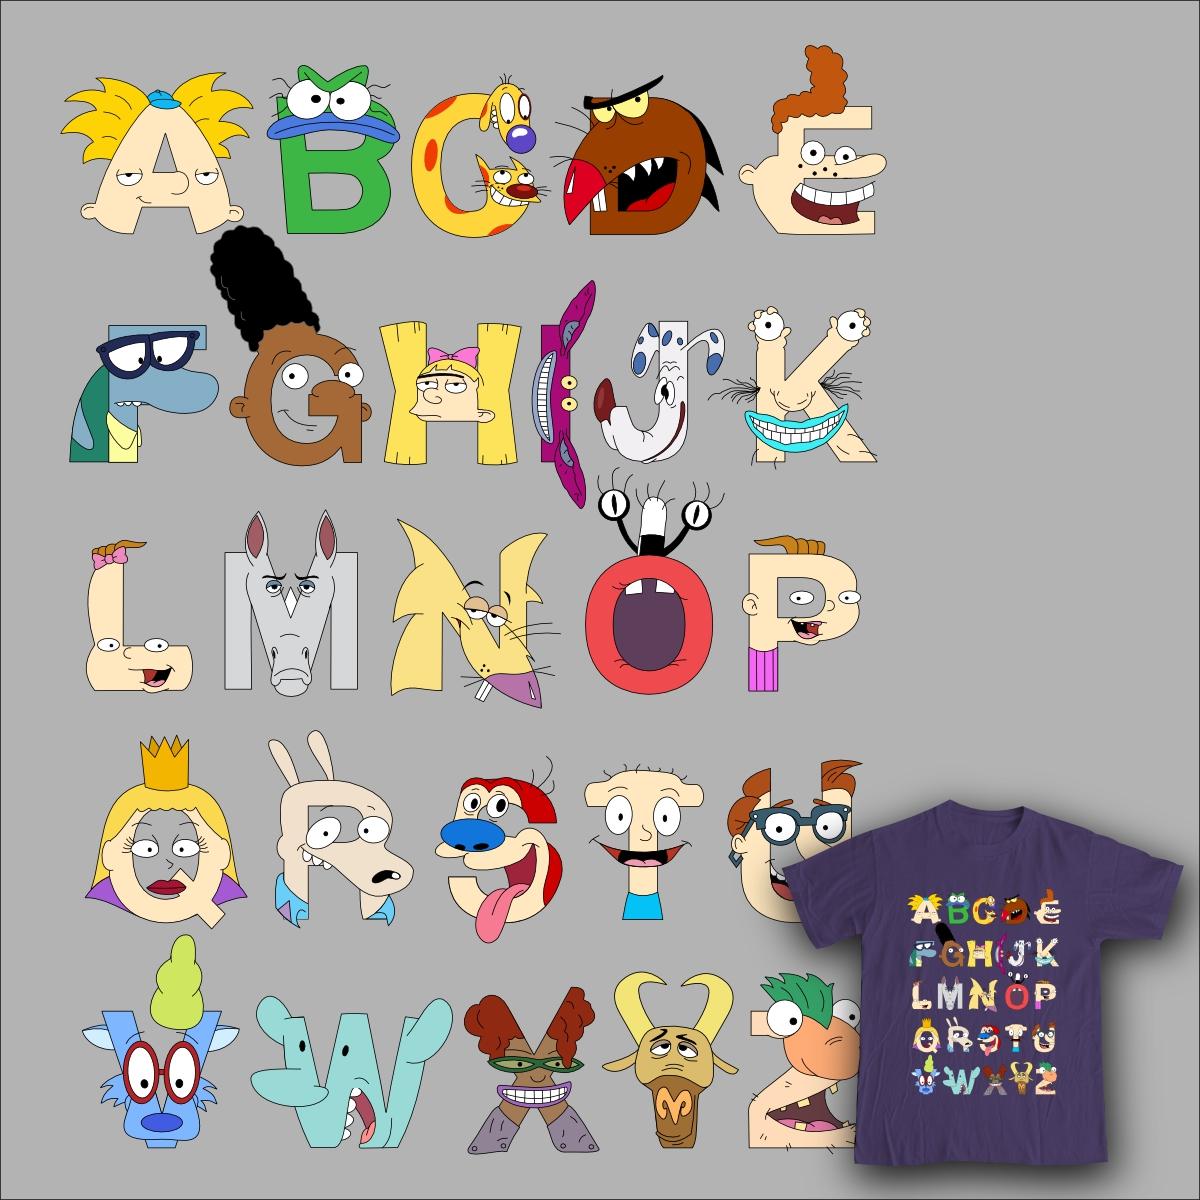 29408d17f010d Score Nickelodeon Alphabet by m baboon on Threadless